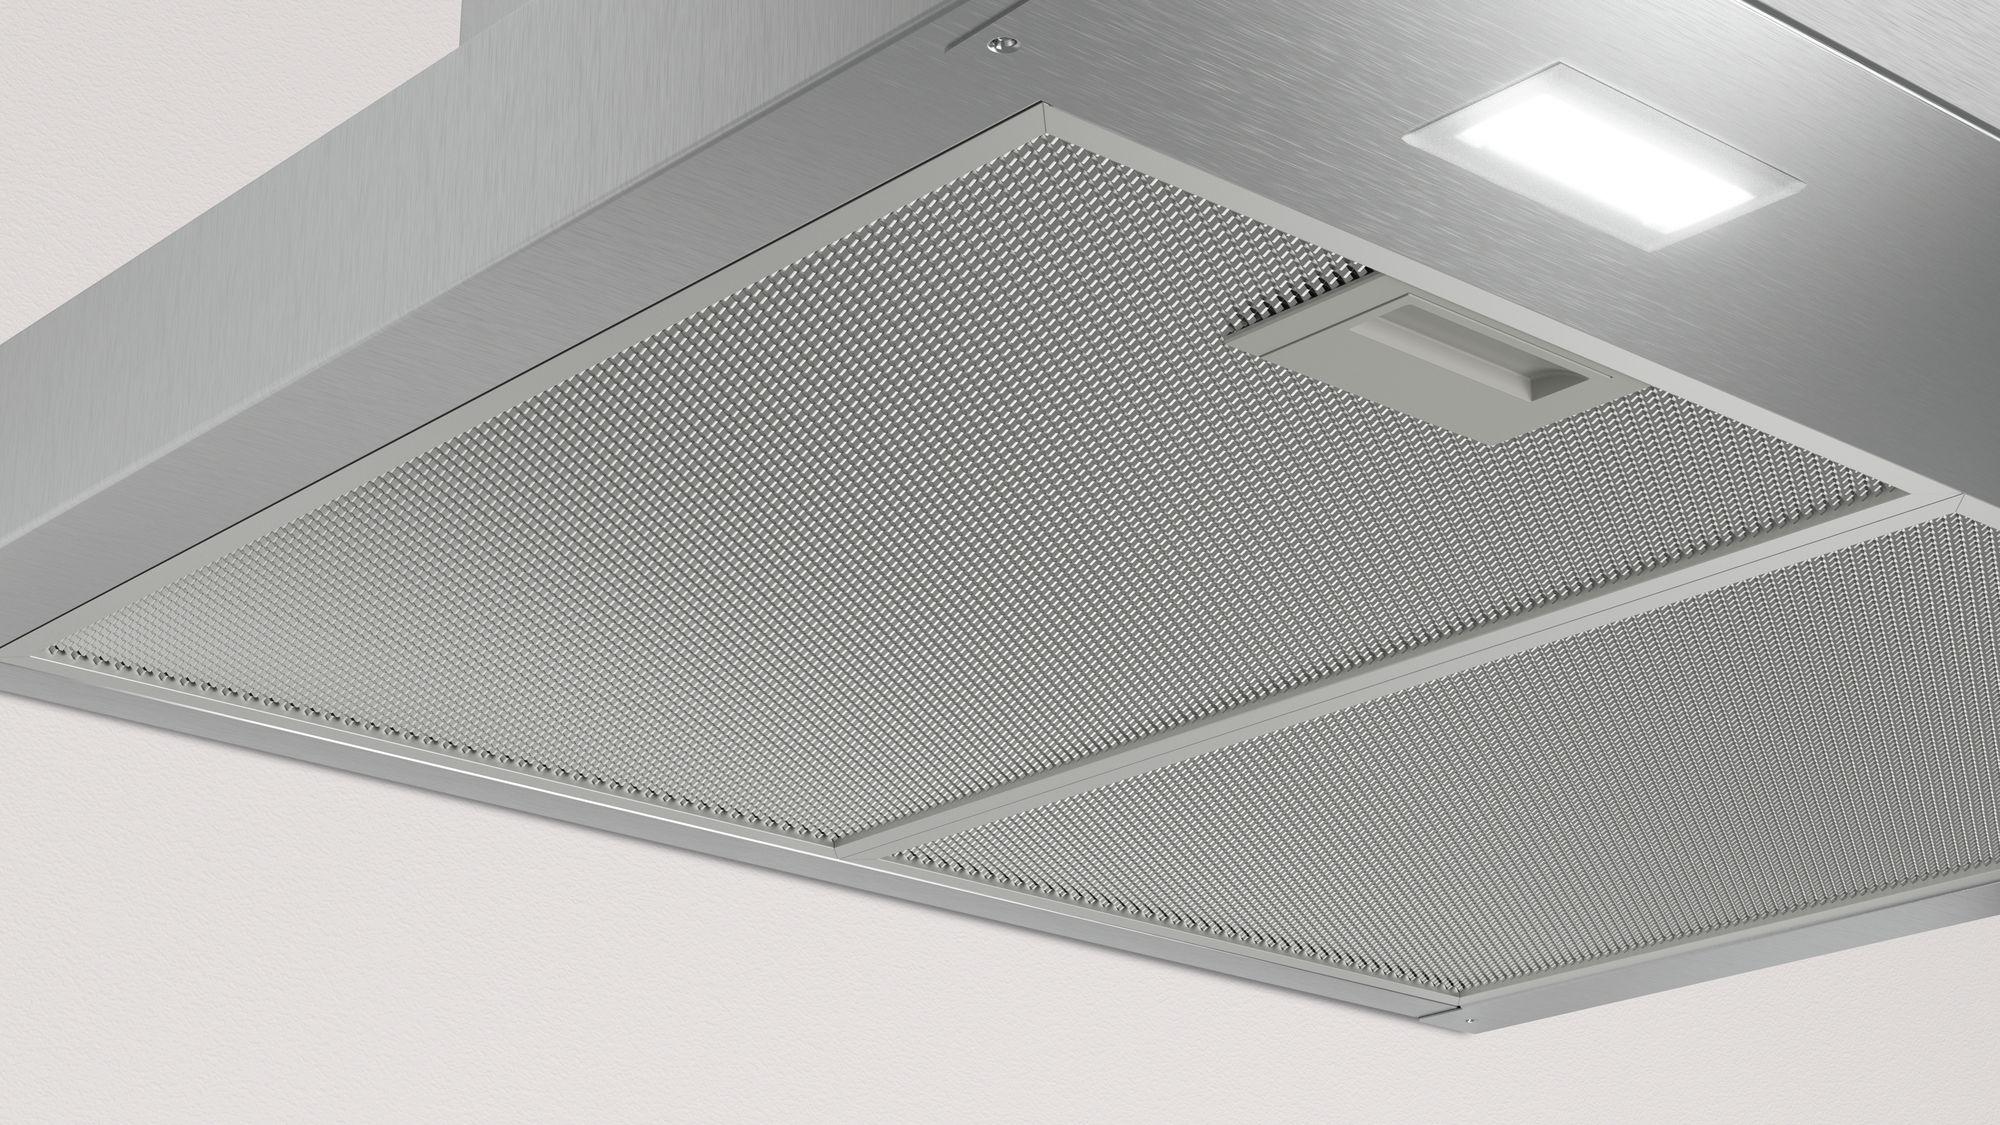 Constructa dunstabzugshaube metallfettfilter reinigen